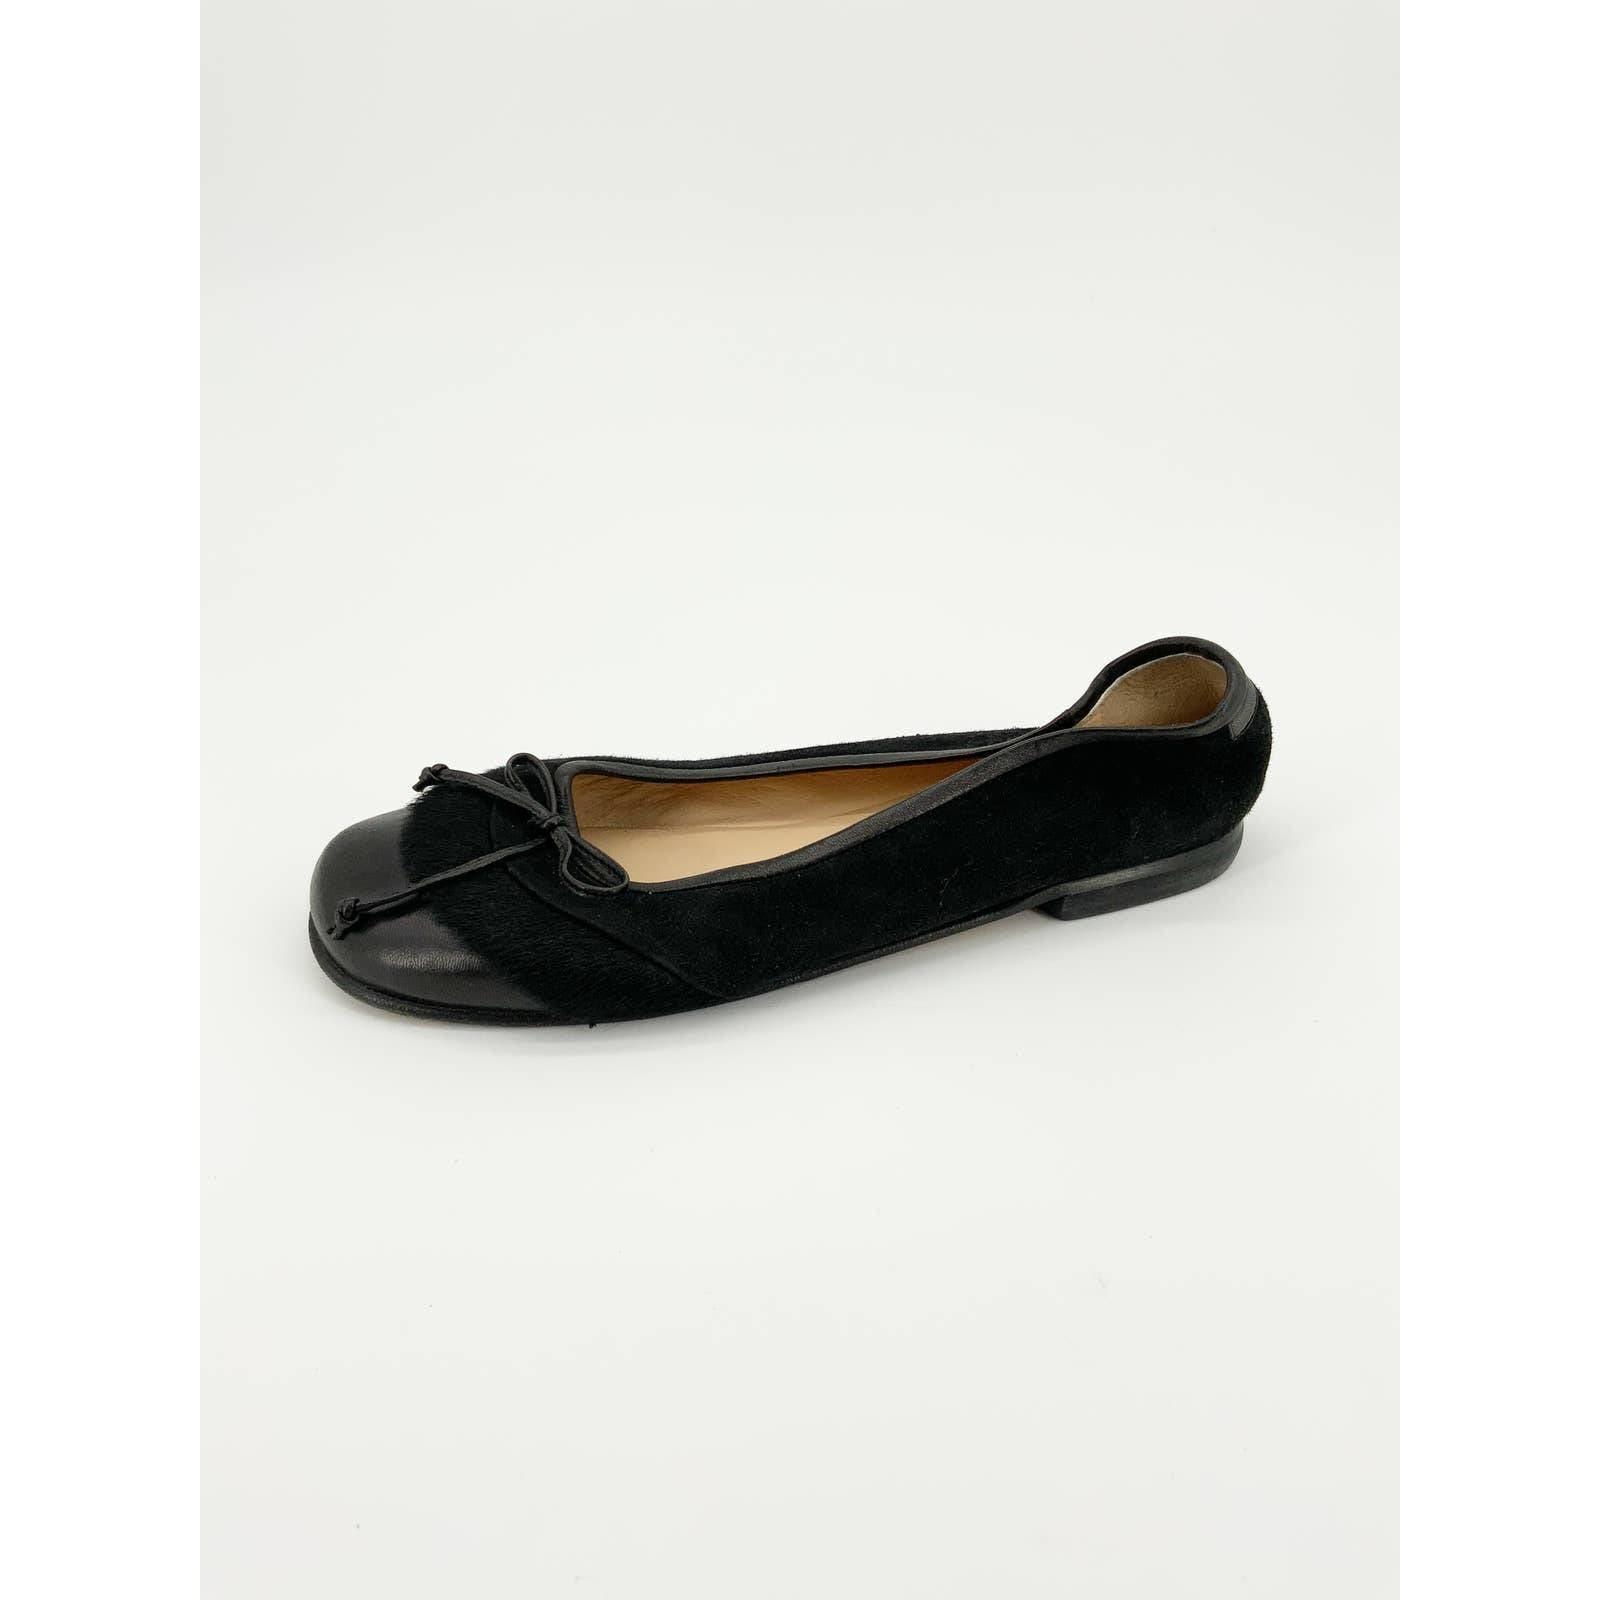 Taryn Rose Ballet Flats Leather Faux Fur